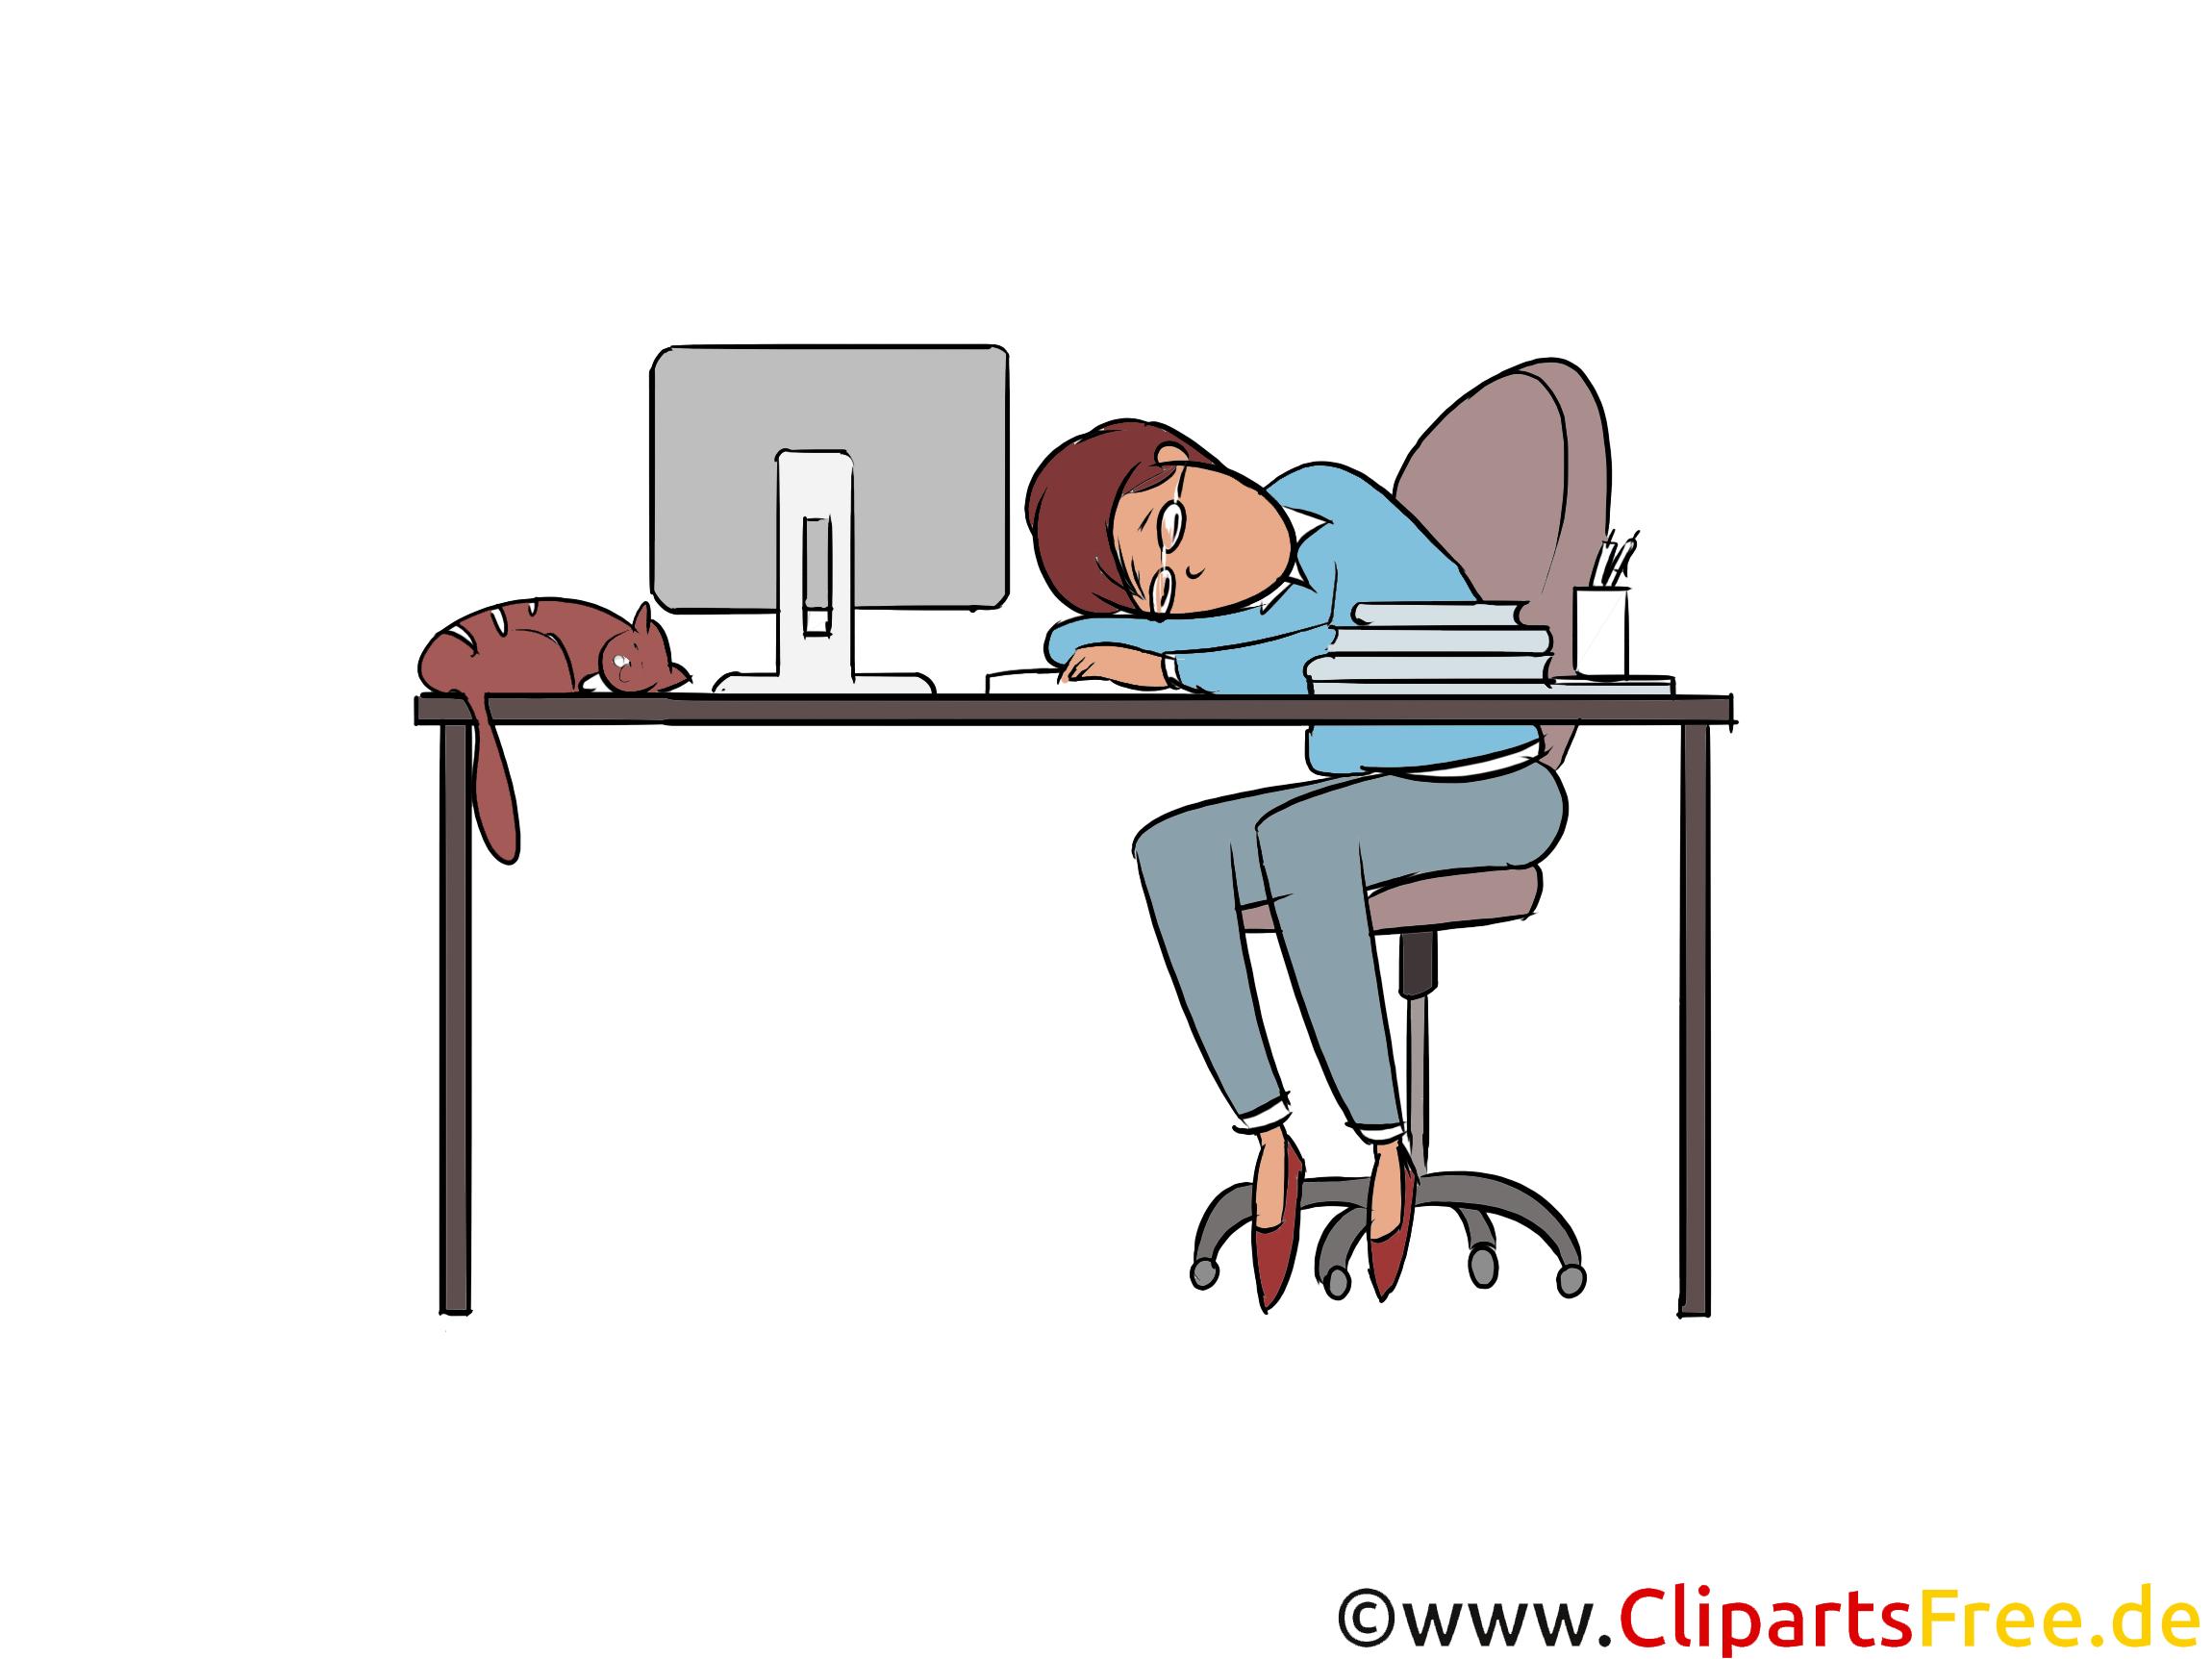 Müde vor Arbeit Clipart, Bild, Illustration